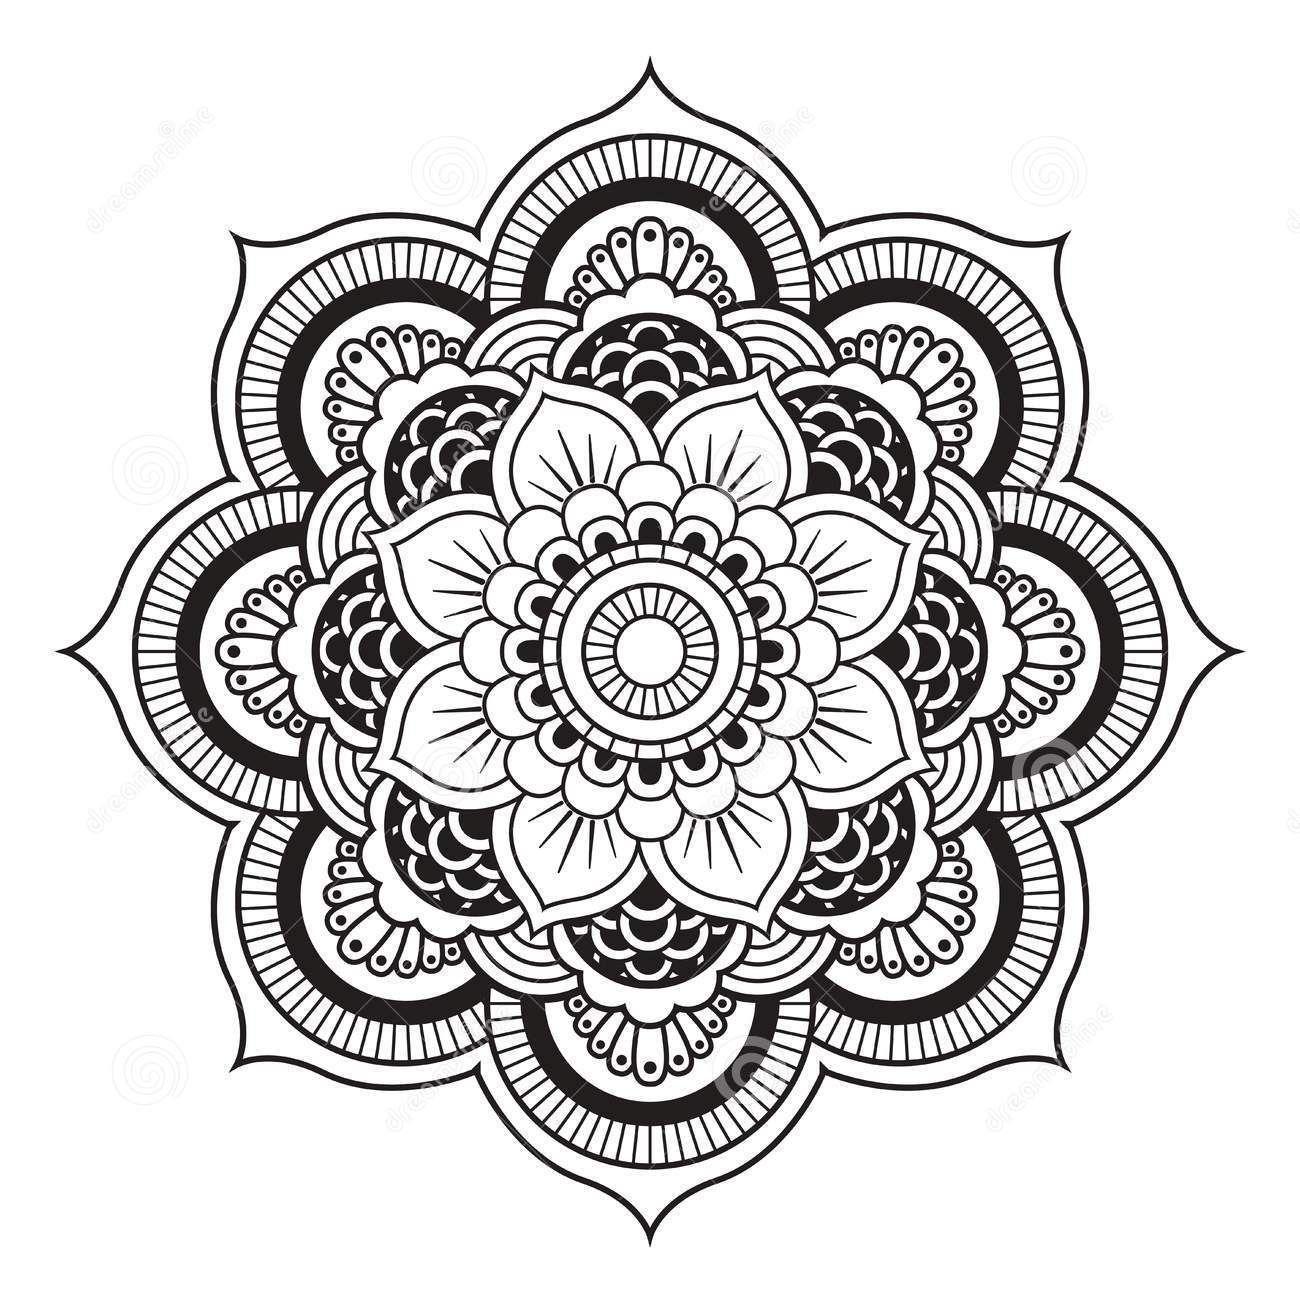 Mandalas  Mandala zum ausdrucken, Mandala vorlagen, Mandala